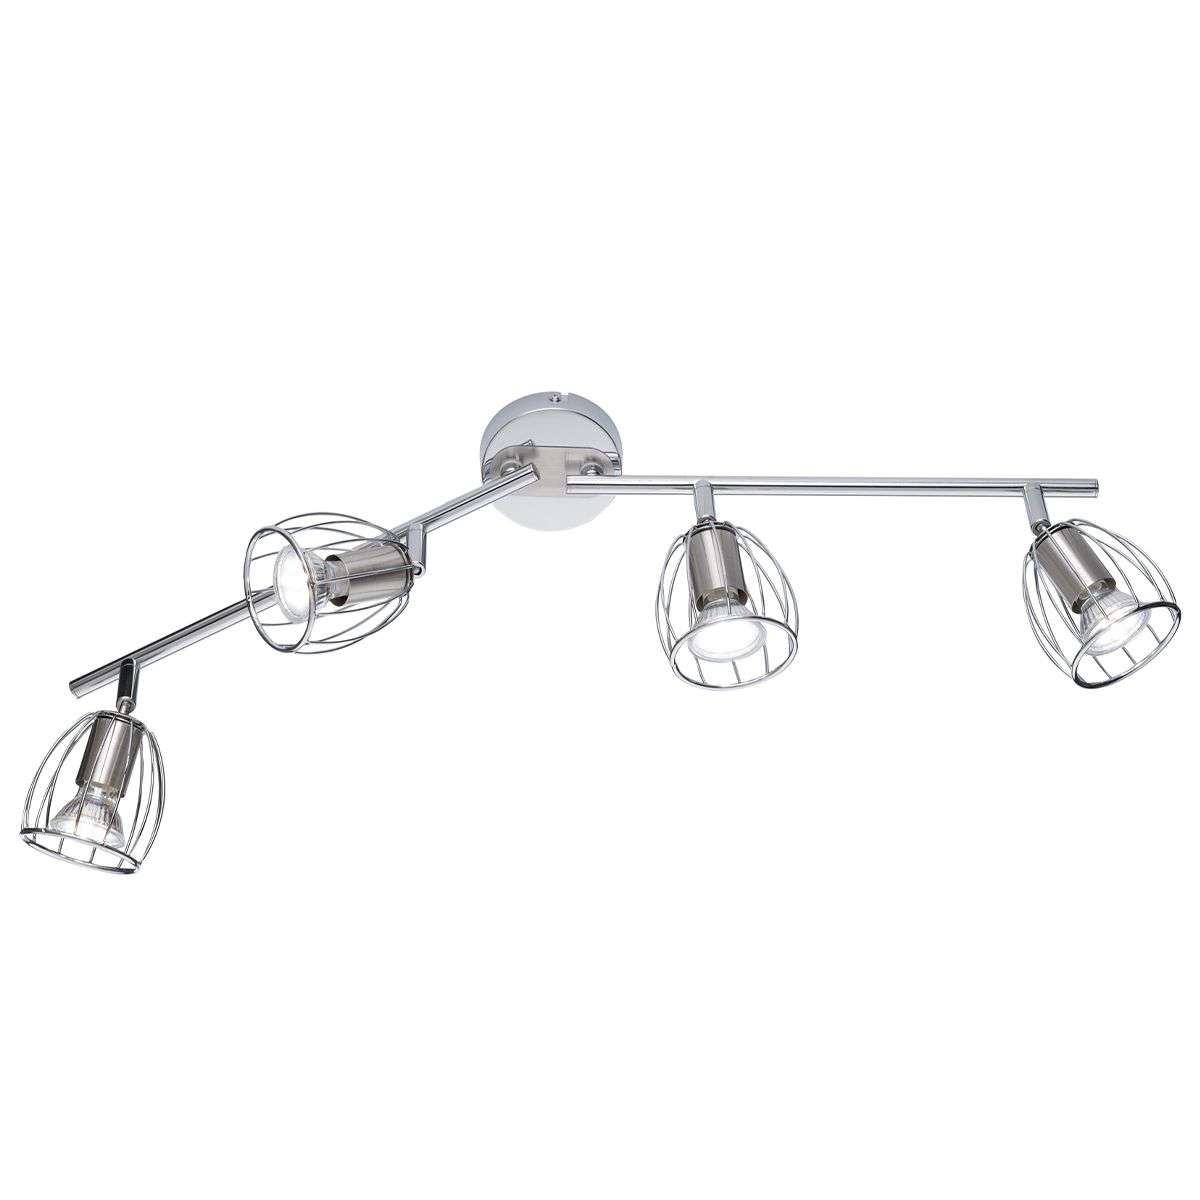 spotlights ceiling lighting. Linear Ceiling Light Evian With Four Spotlights-8029166-31 Spotlights Lighting